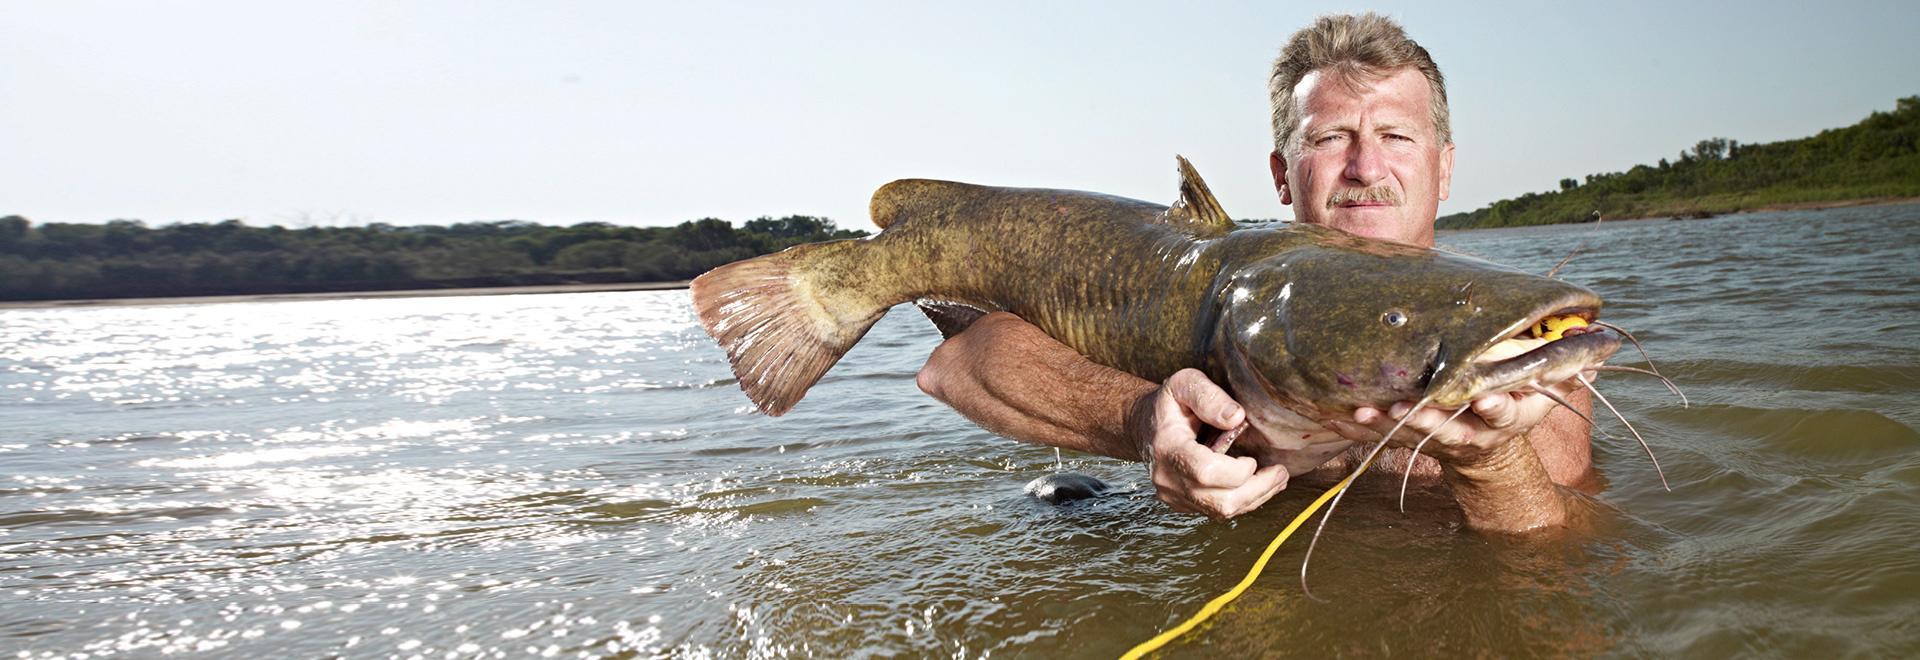 Pesca a mani nude